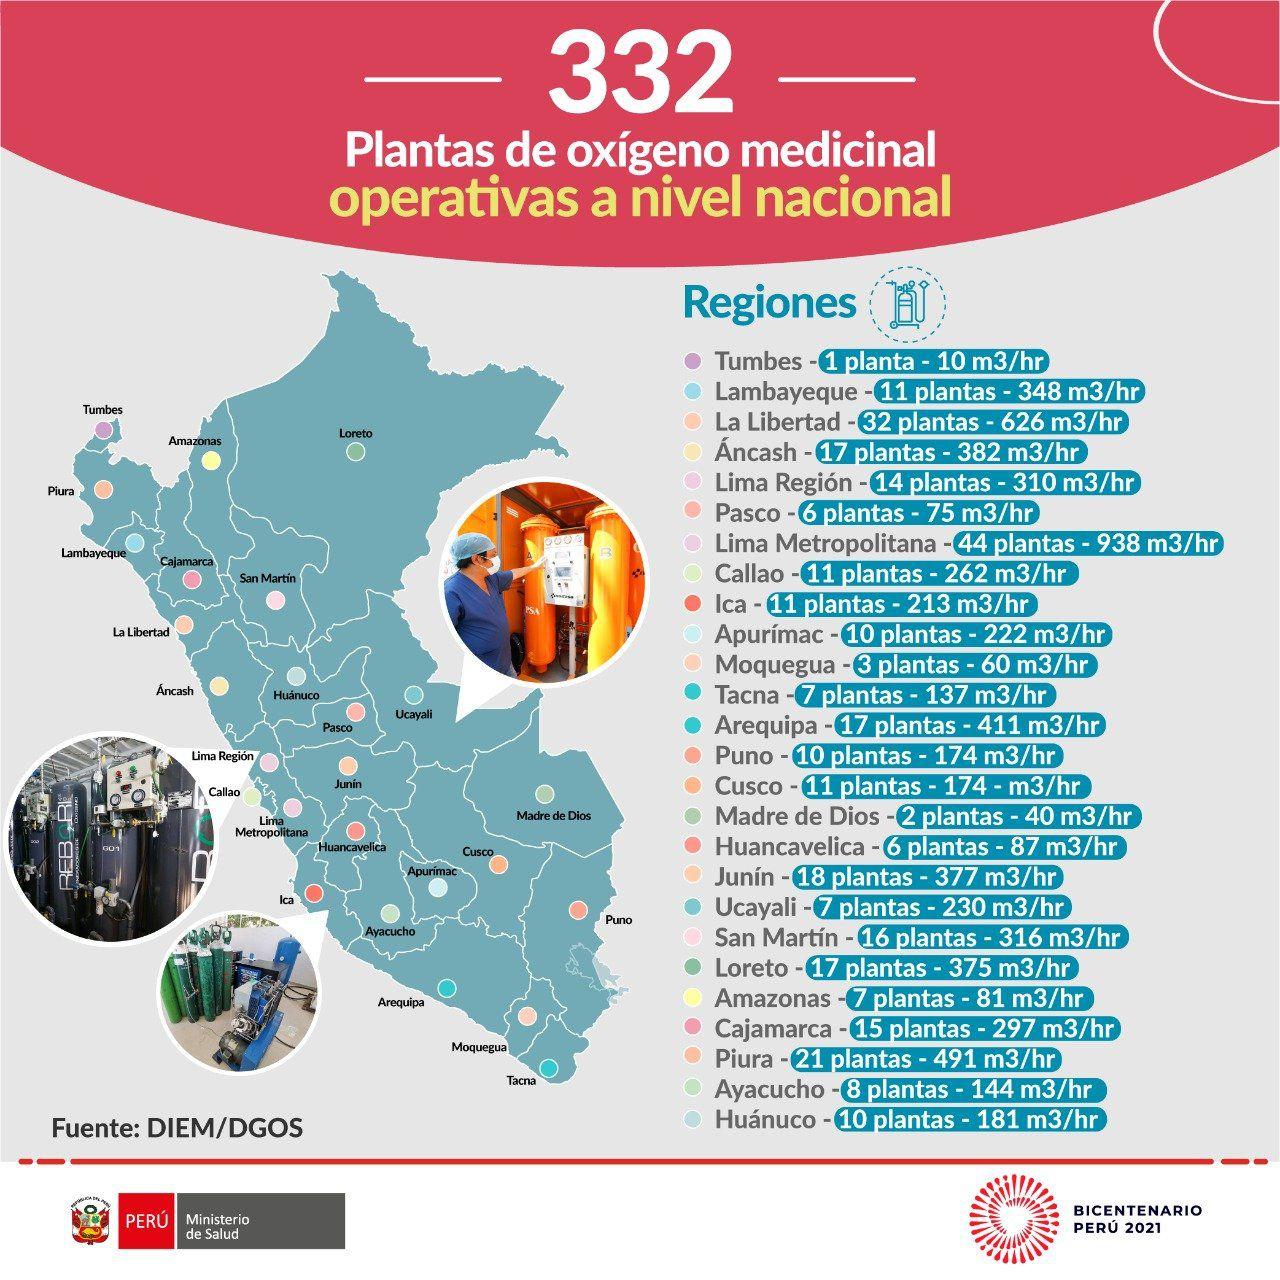 Minsa infirmó en agosto pasado que 332 plantas de oxígeno se encontraban operativas a nivel nacional.  (Imagen: @Minsa_Peru)